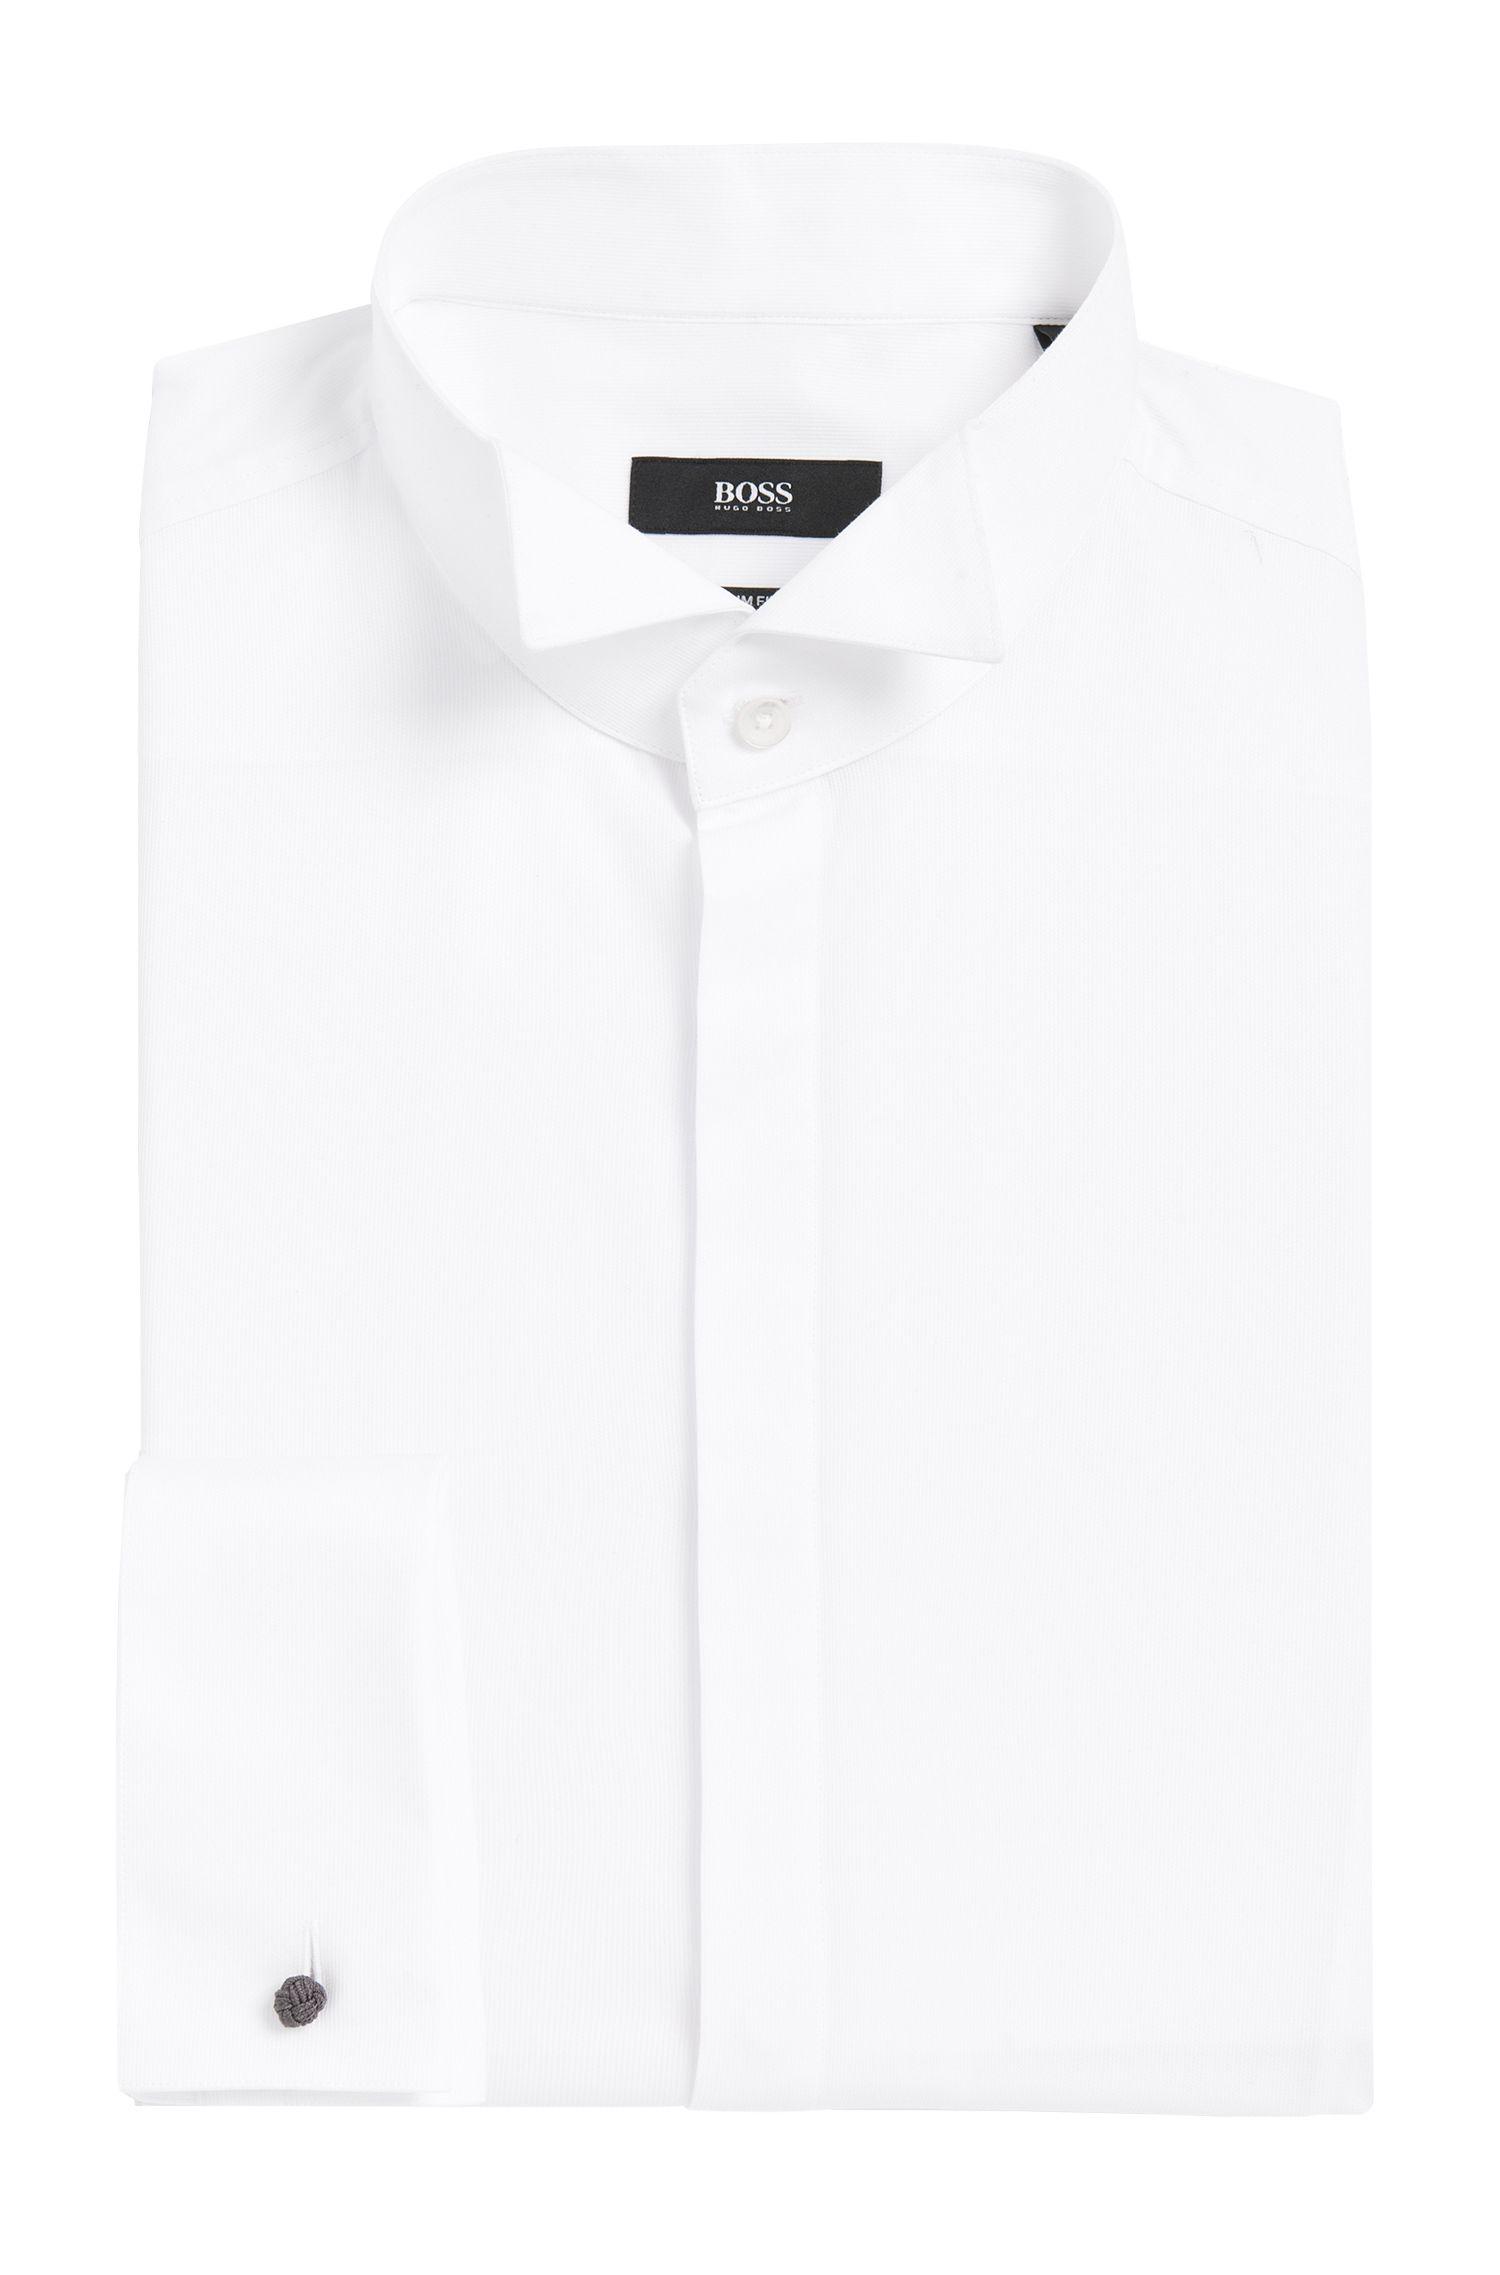 Wingtip Cotton Dress Shirt, Slim Fit | Jillik